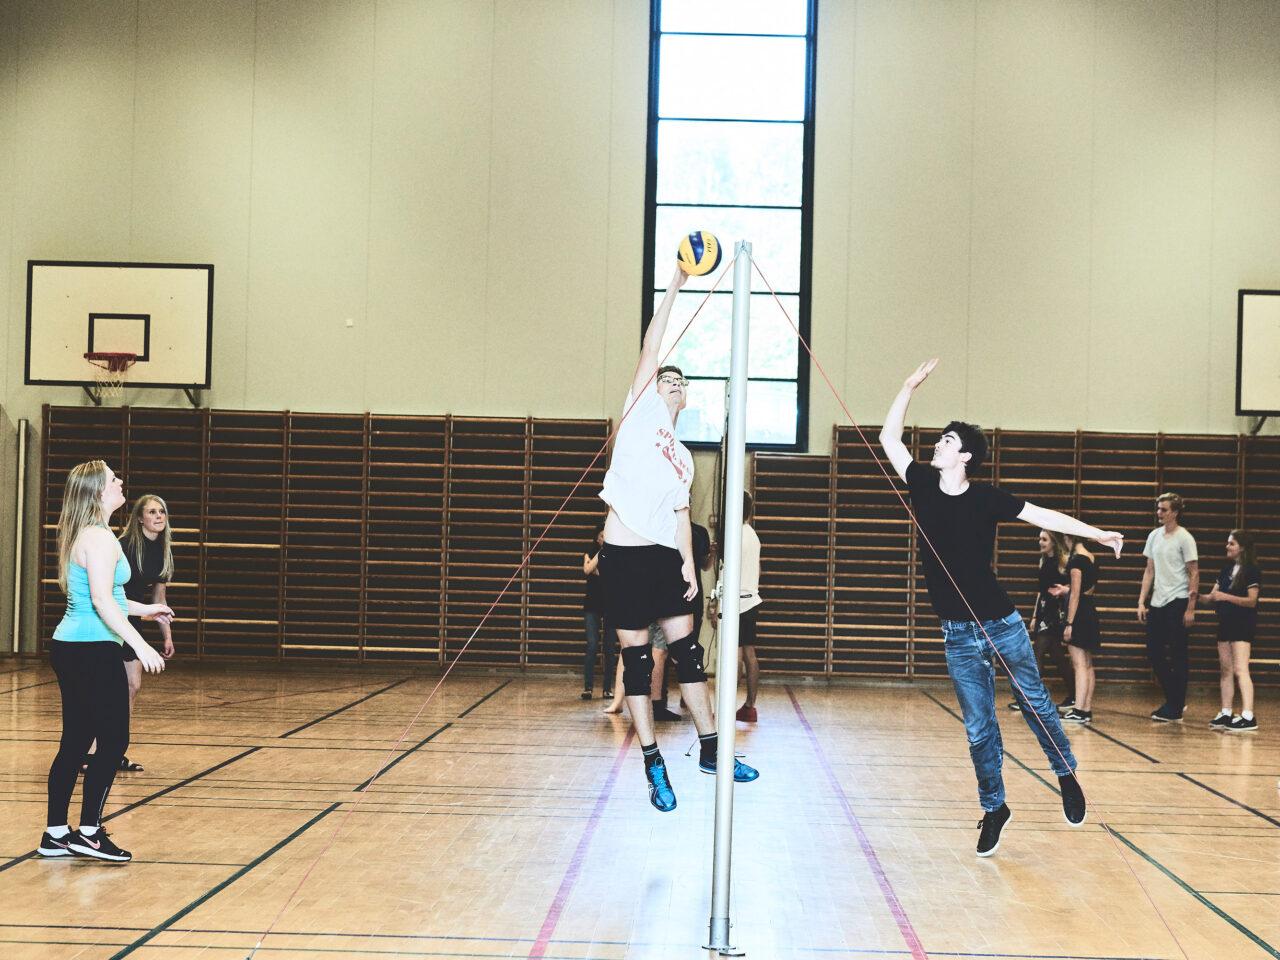 Elever spiller volleyball